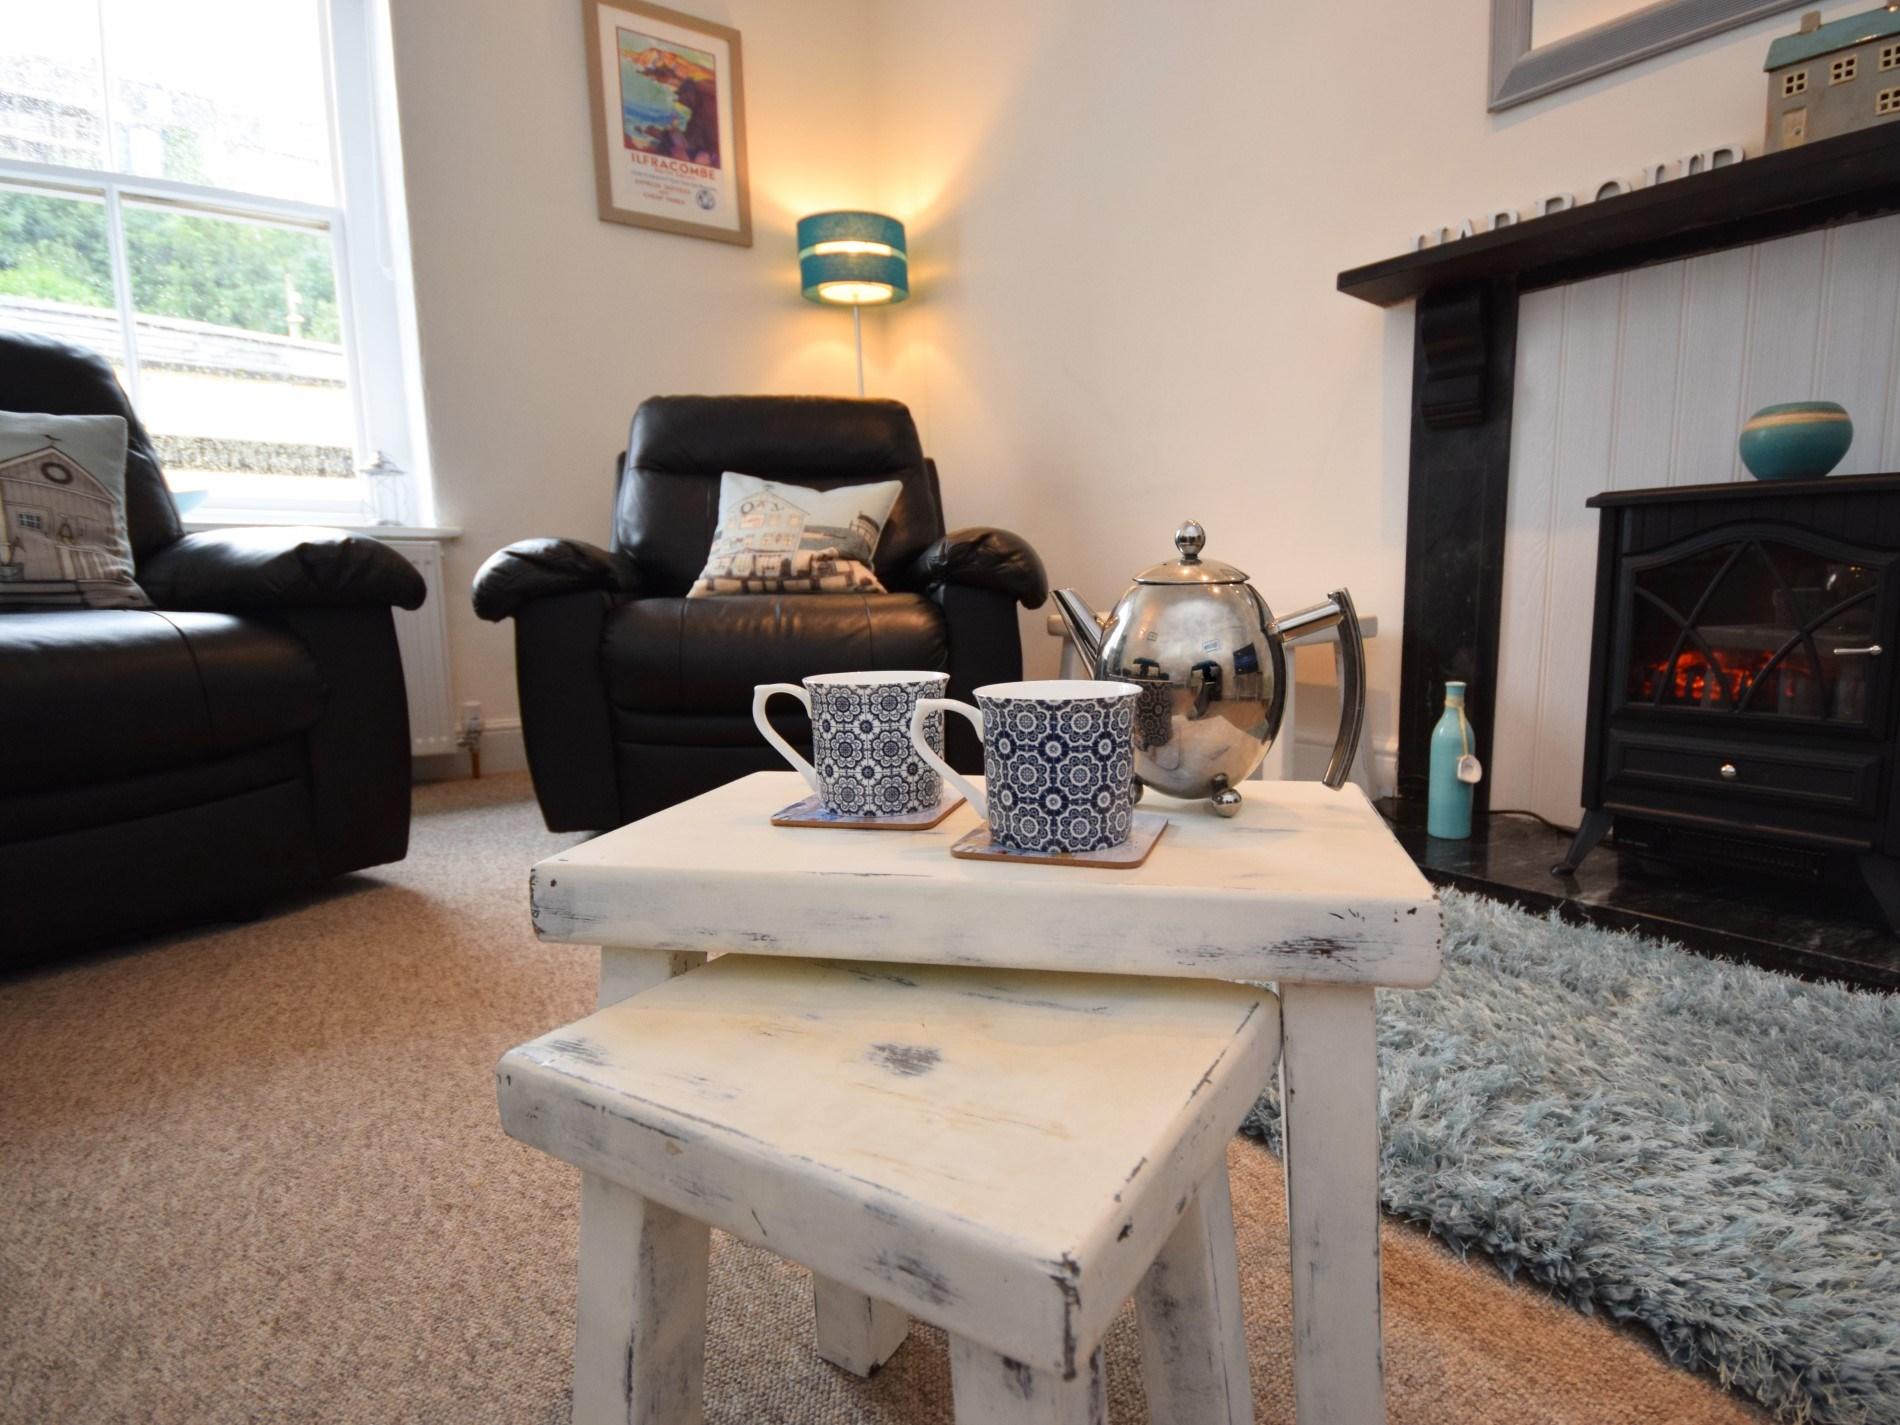 2 Bedroom Cottage in Ilfracombe, Devon